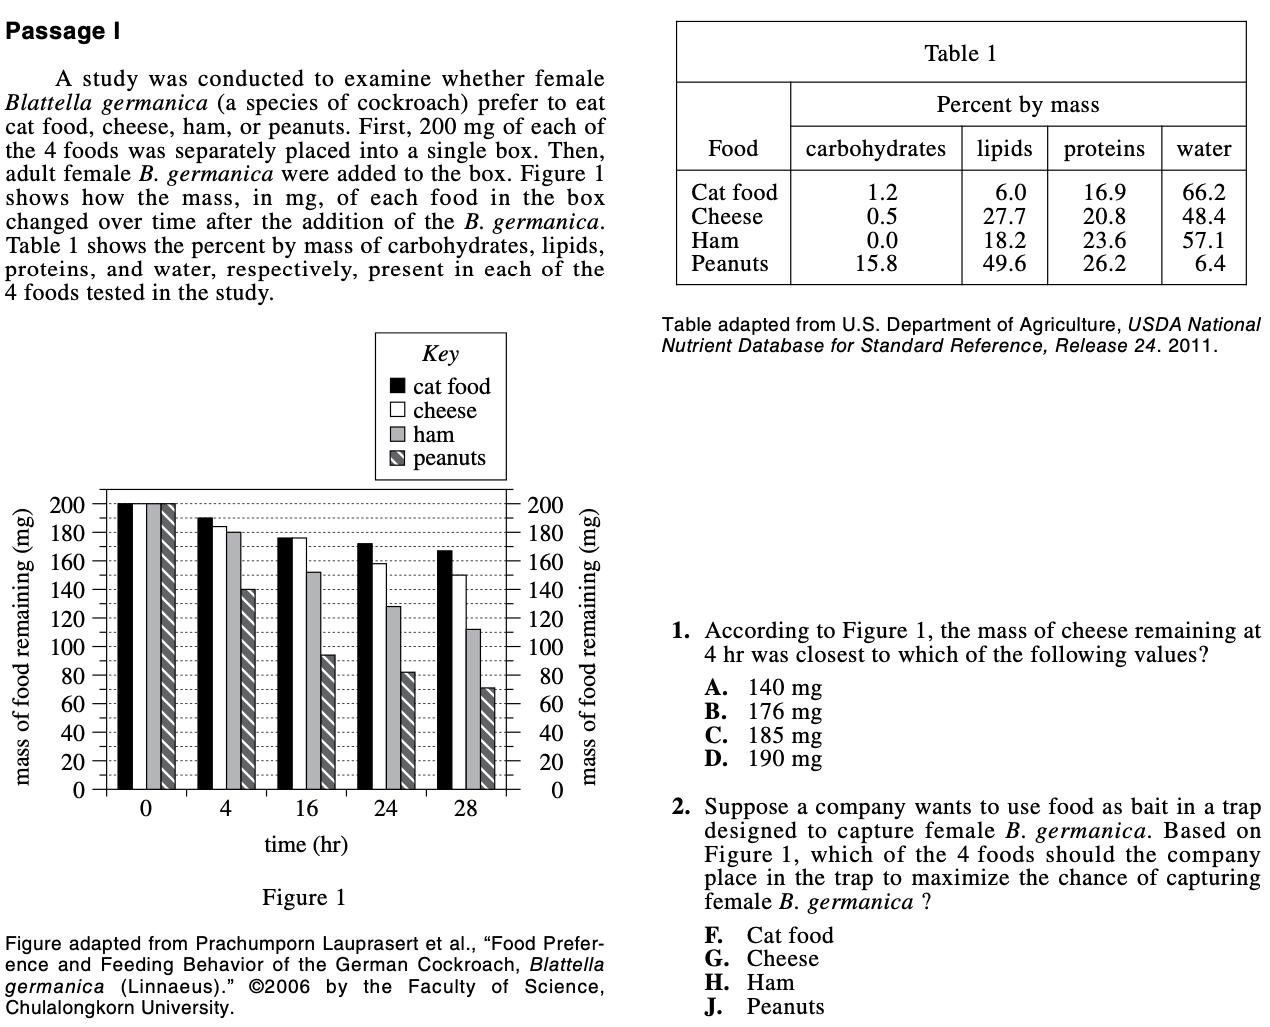 ACT Science 2021 Data Representation Example